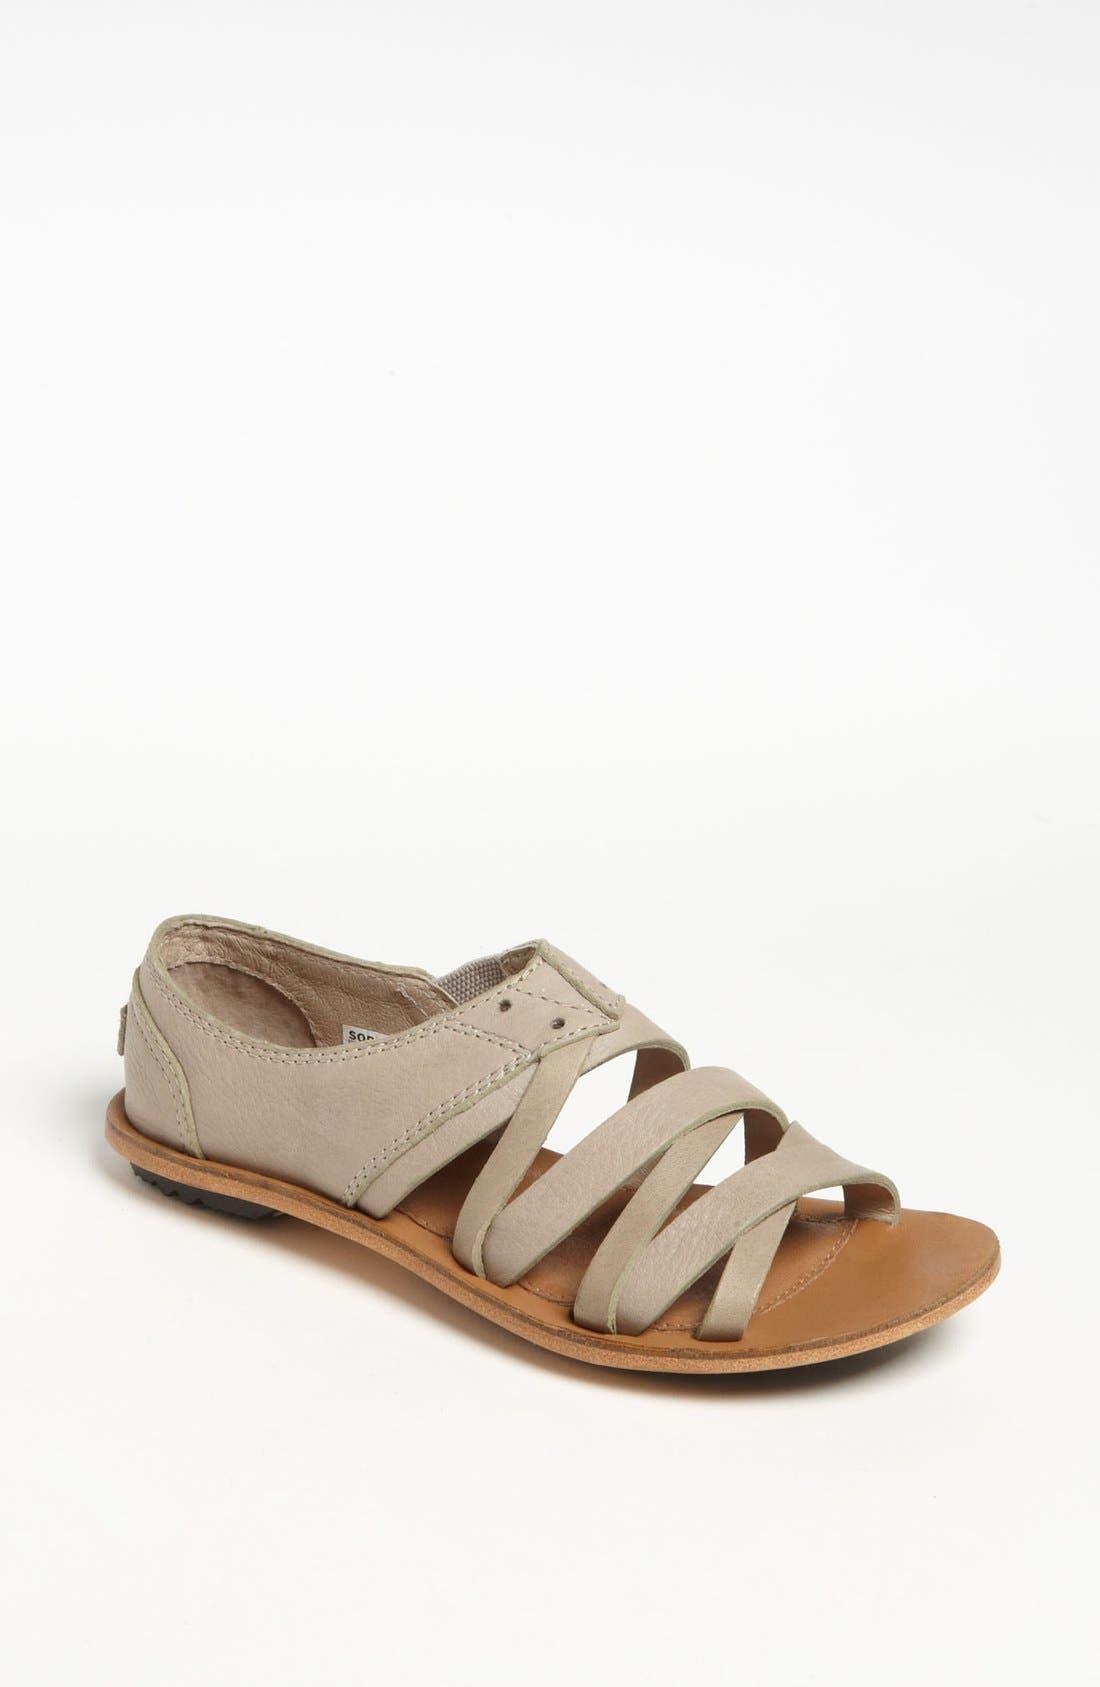 Main Image - Sorel 'Lake' Shoe Sandal